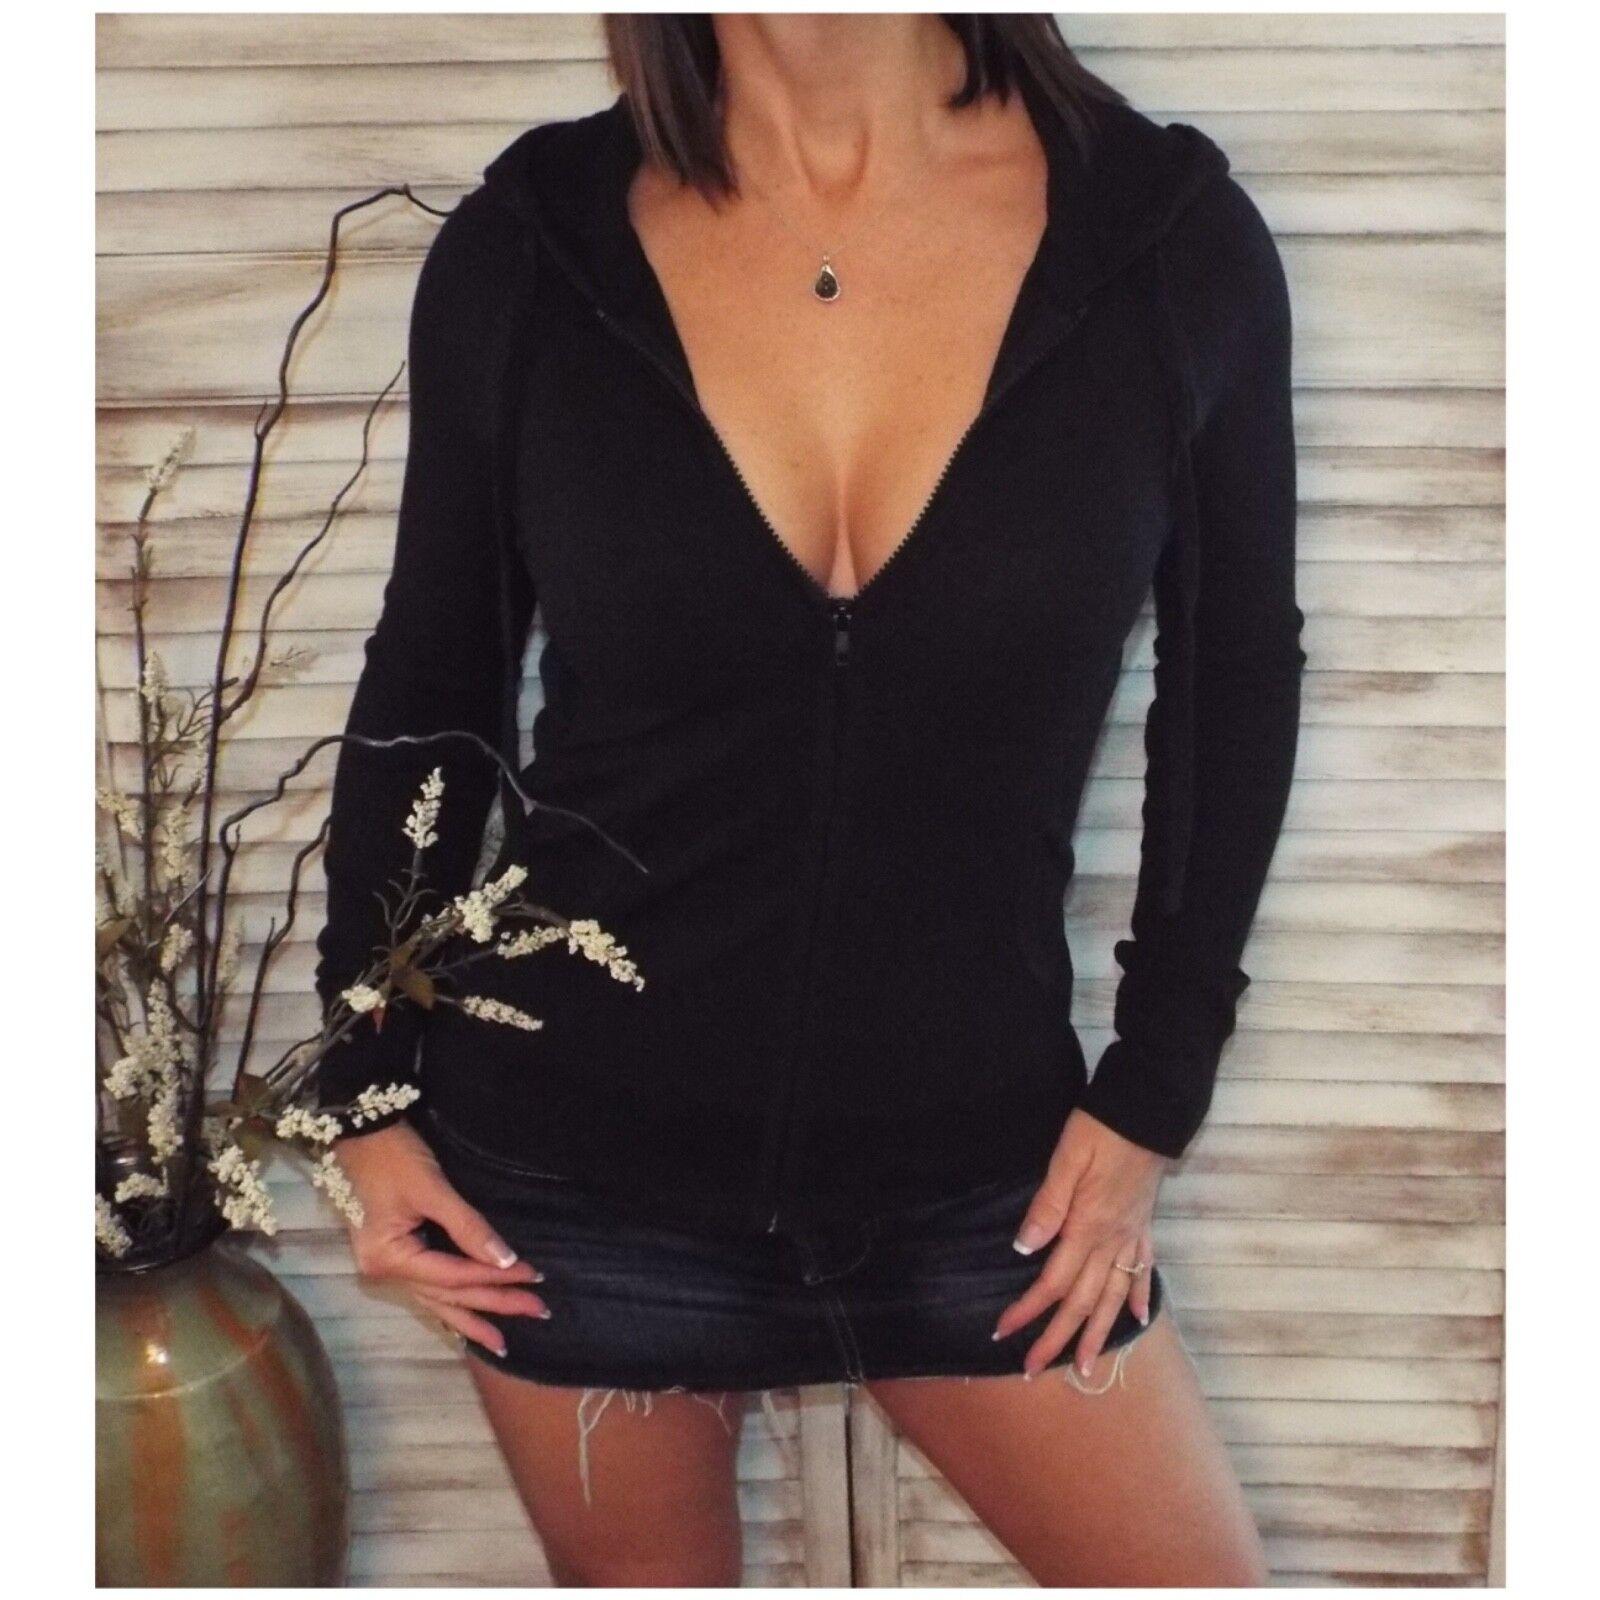 Very Sexy Zip Up Waffle Thermal Hoodie Light Jacket Sweater Yoga Black XL/1X/2X